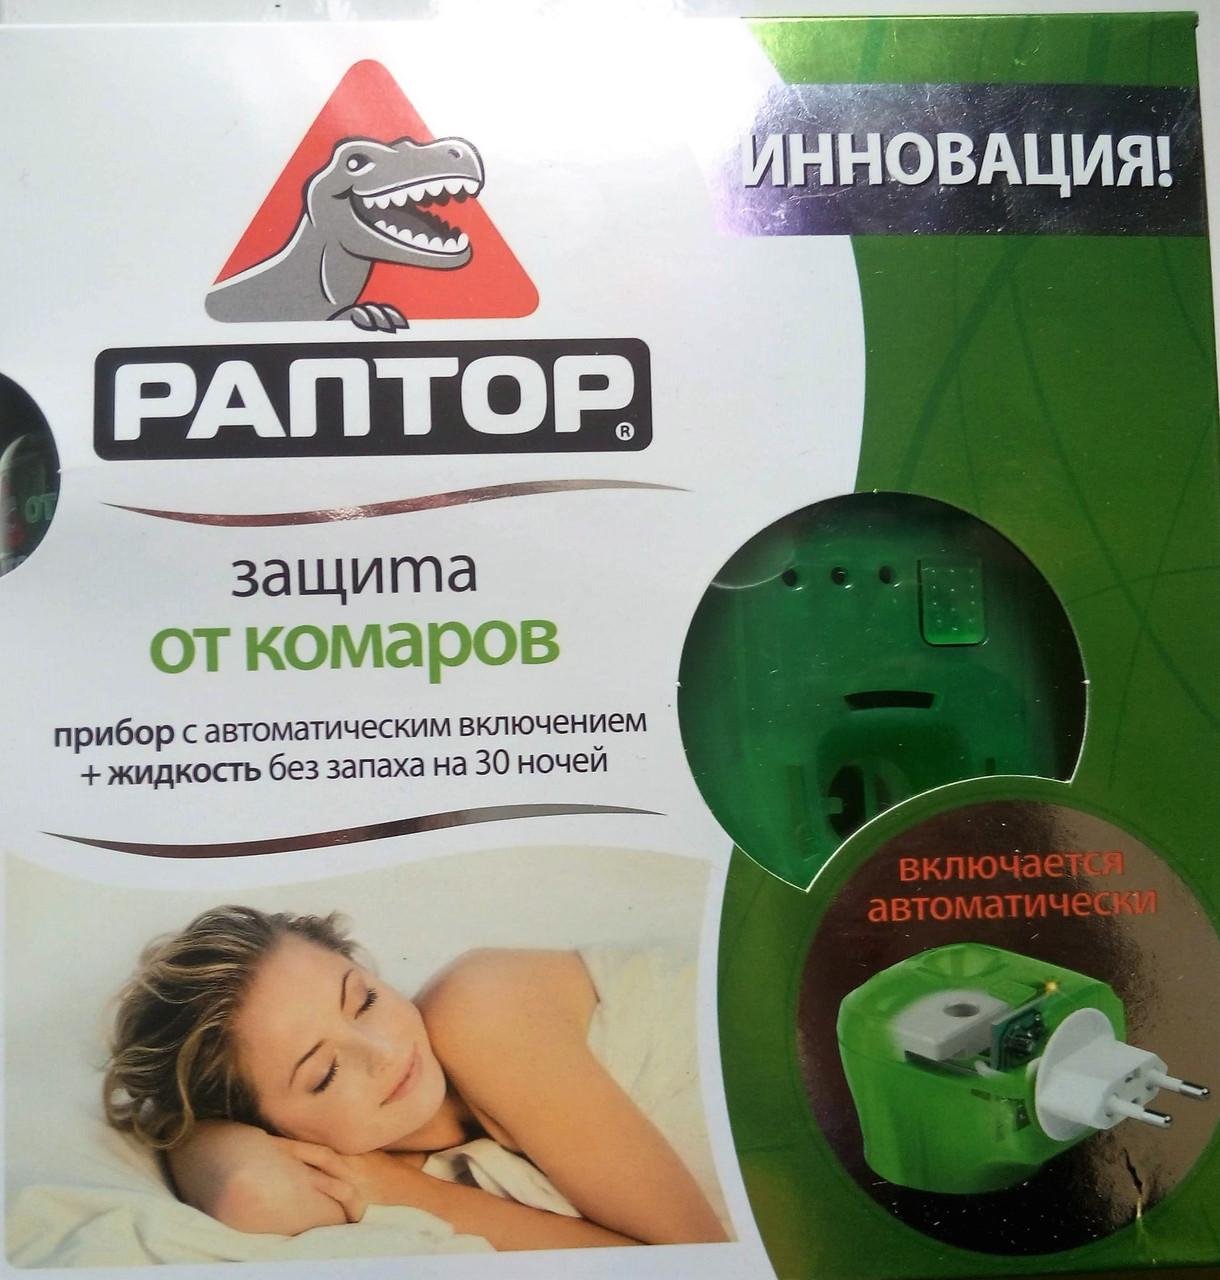 Набор Раптор фумигатор с автоматическим включением + жидкость без запаха на 30 ночей - Agroline. в Одессе